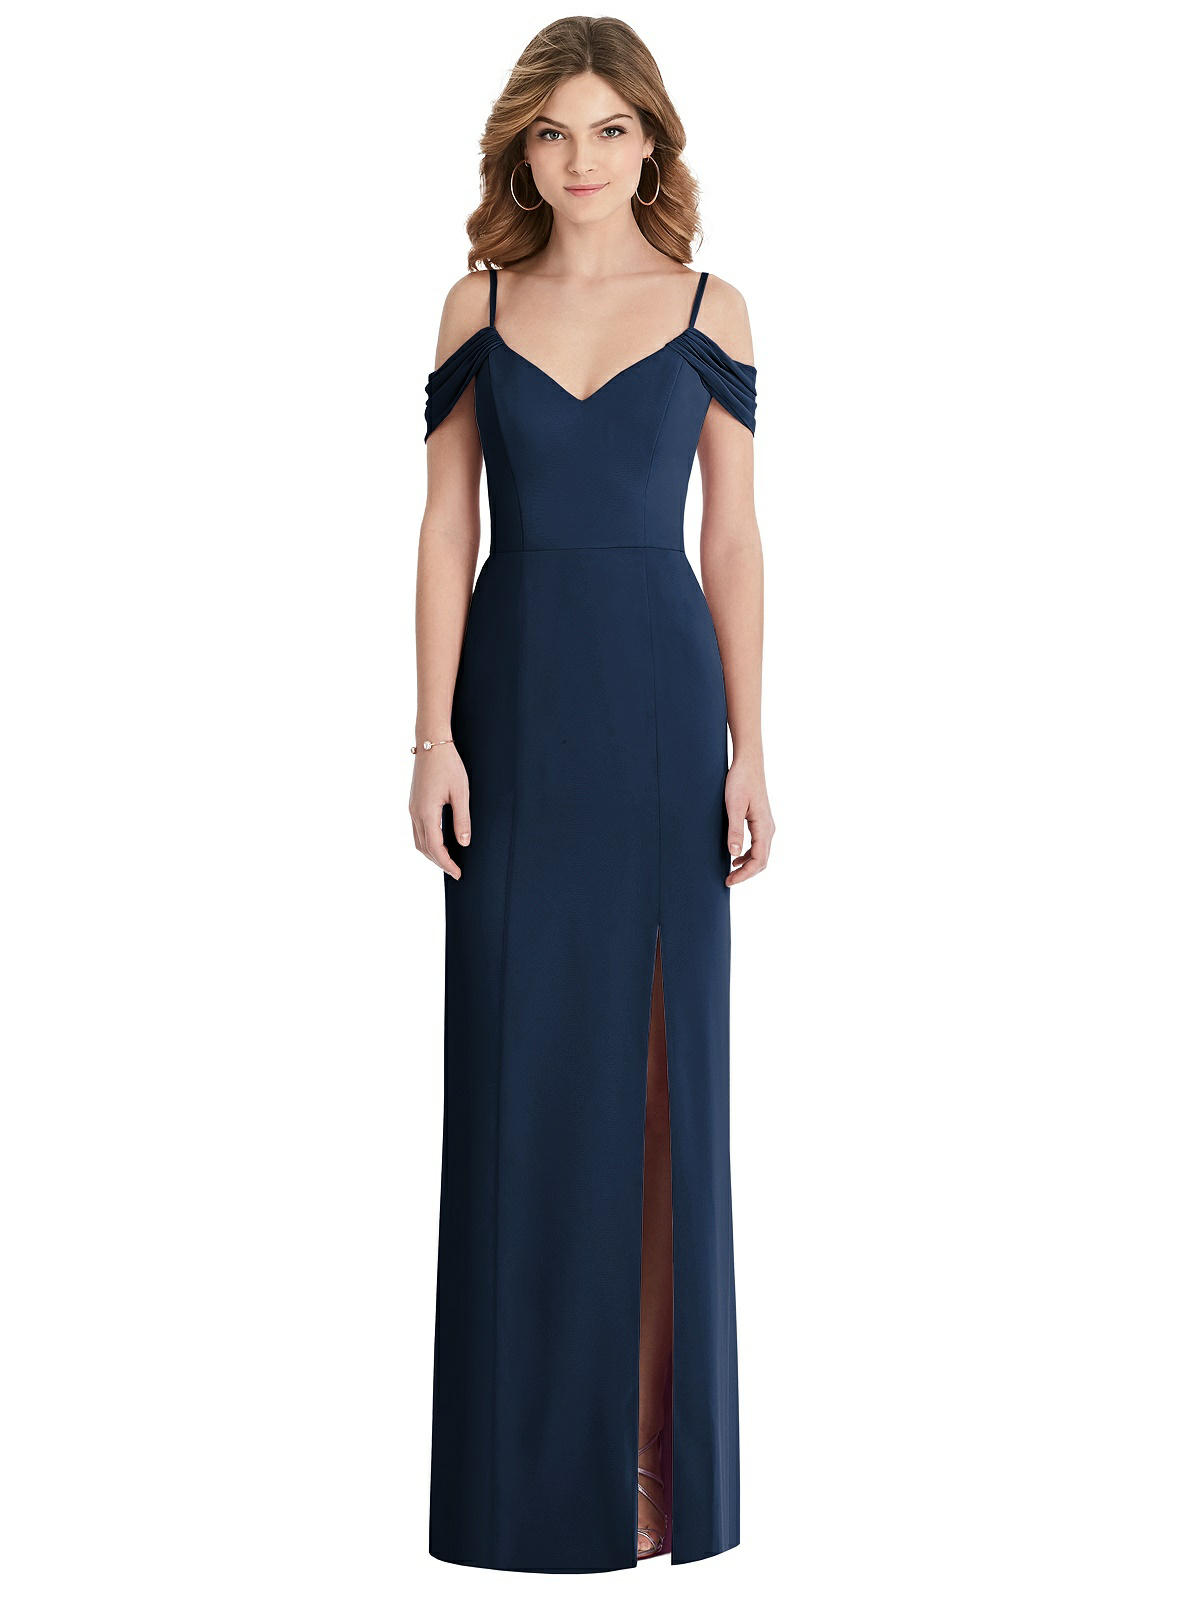 Emmy Midnight Blue Bridesmaids Dress by Dessy